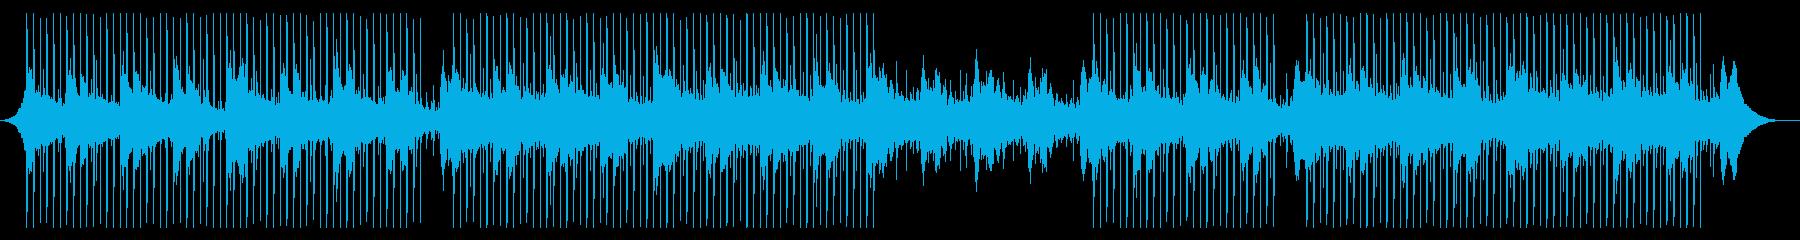 Health Medical's reproduced waveform